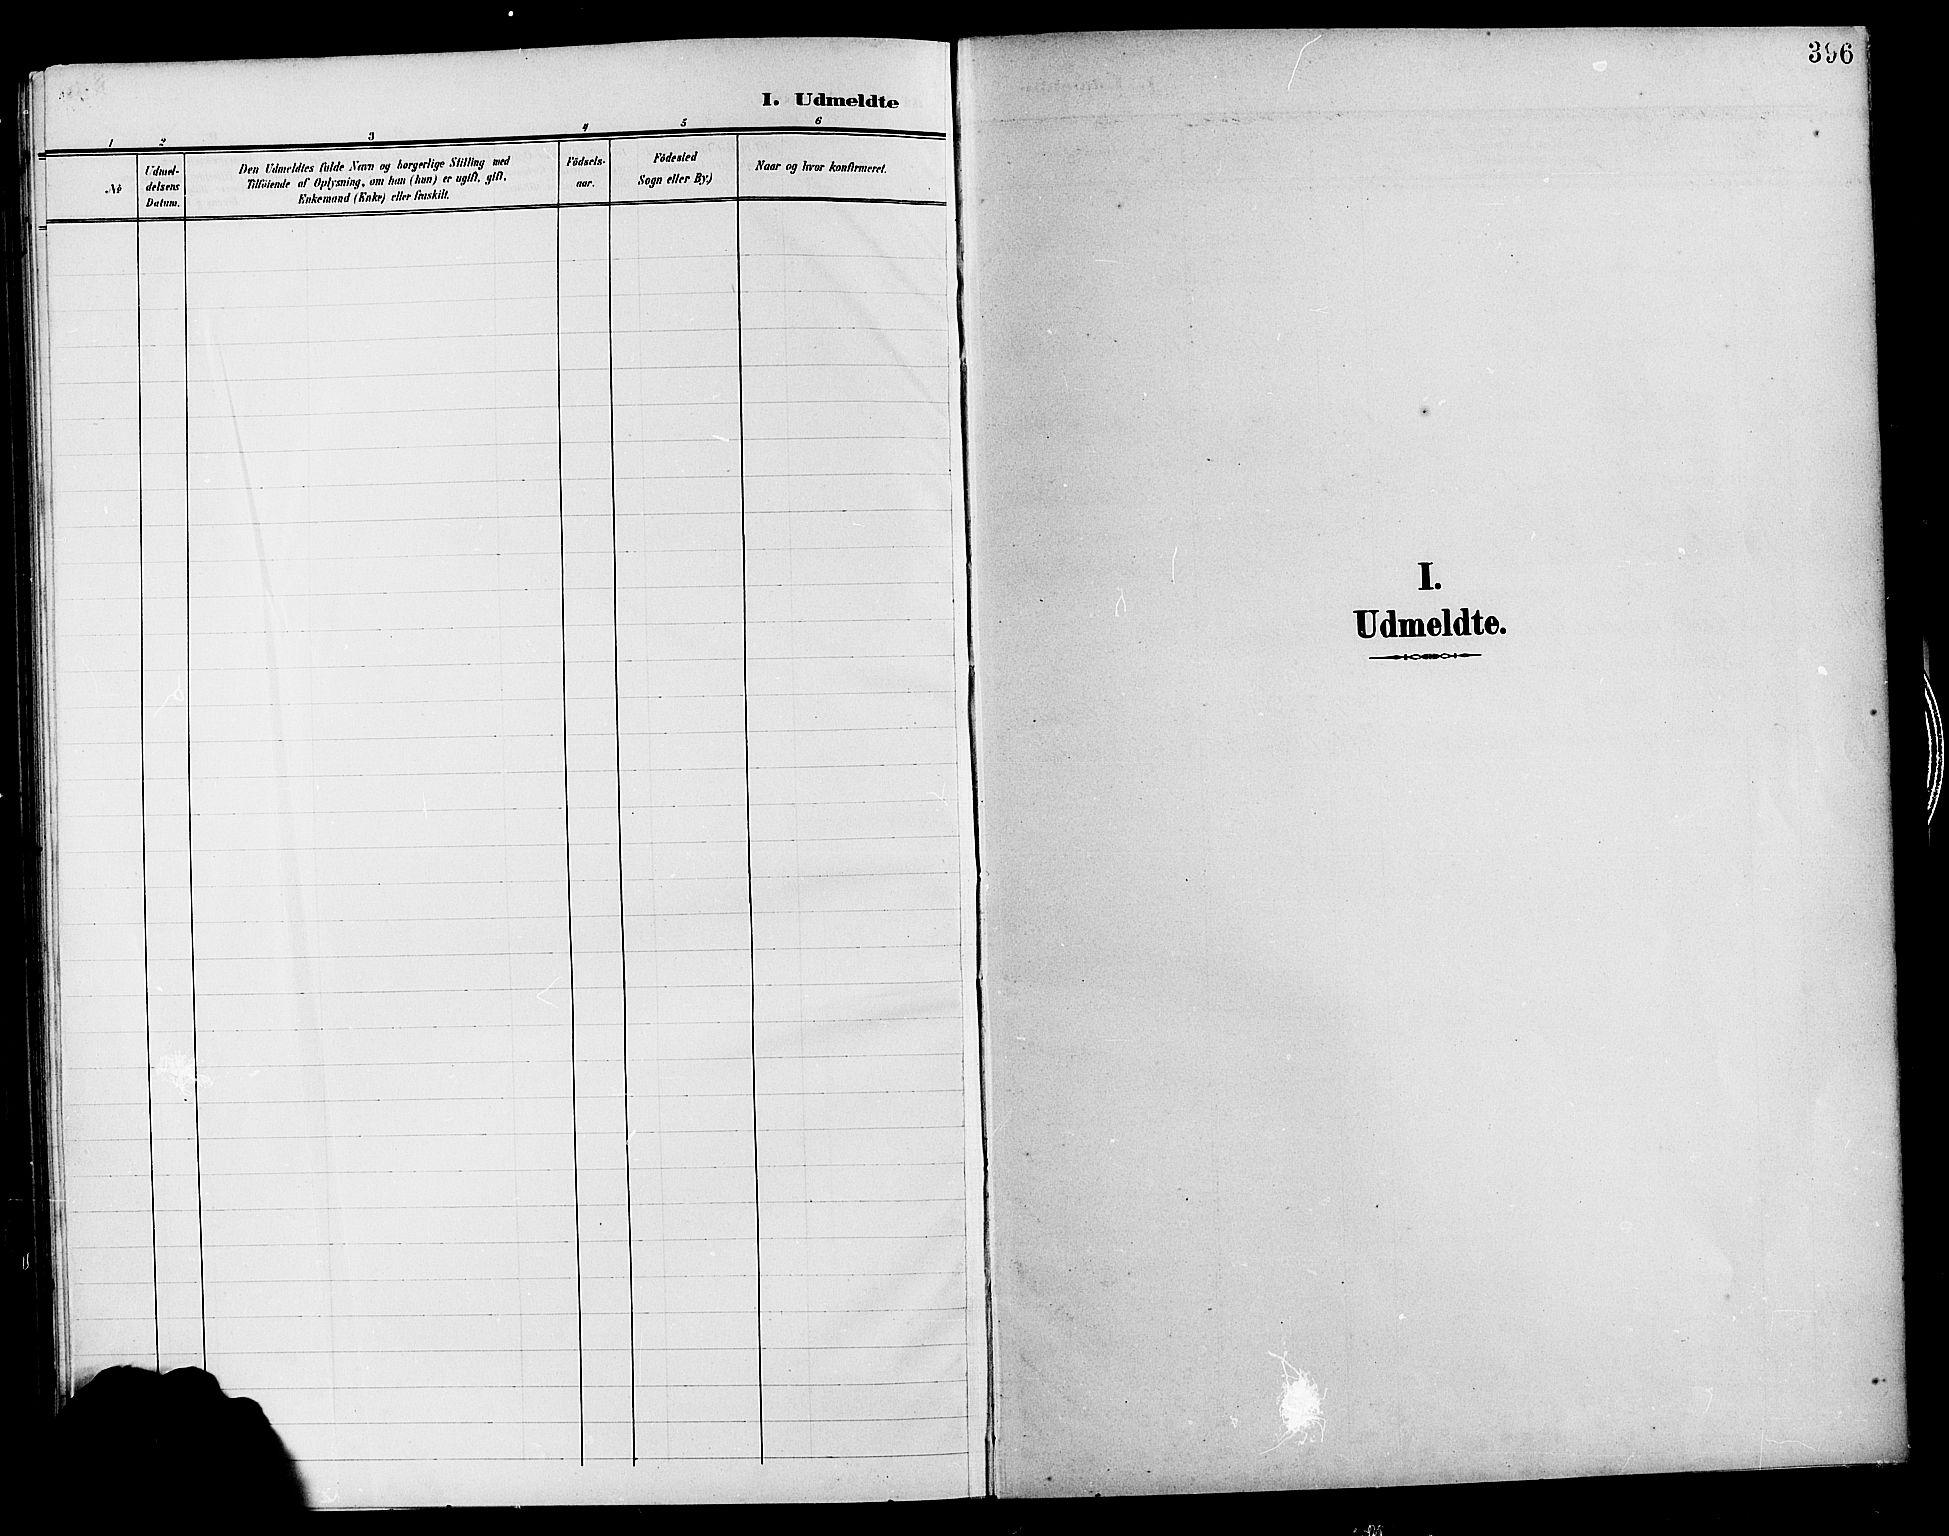 SAH, Lillehammer prestekontor, H/Ha/Hab/L0001: Parish register (copy) no. 1, 1901-1913, p. 396